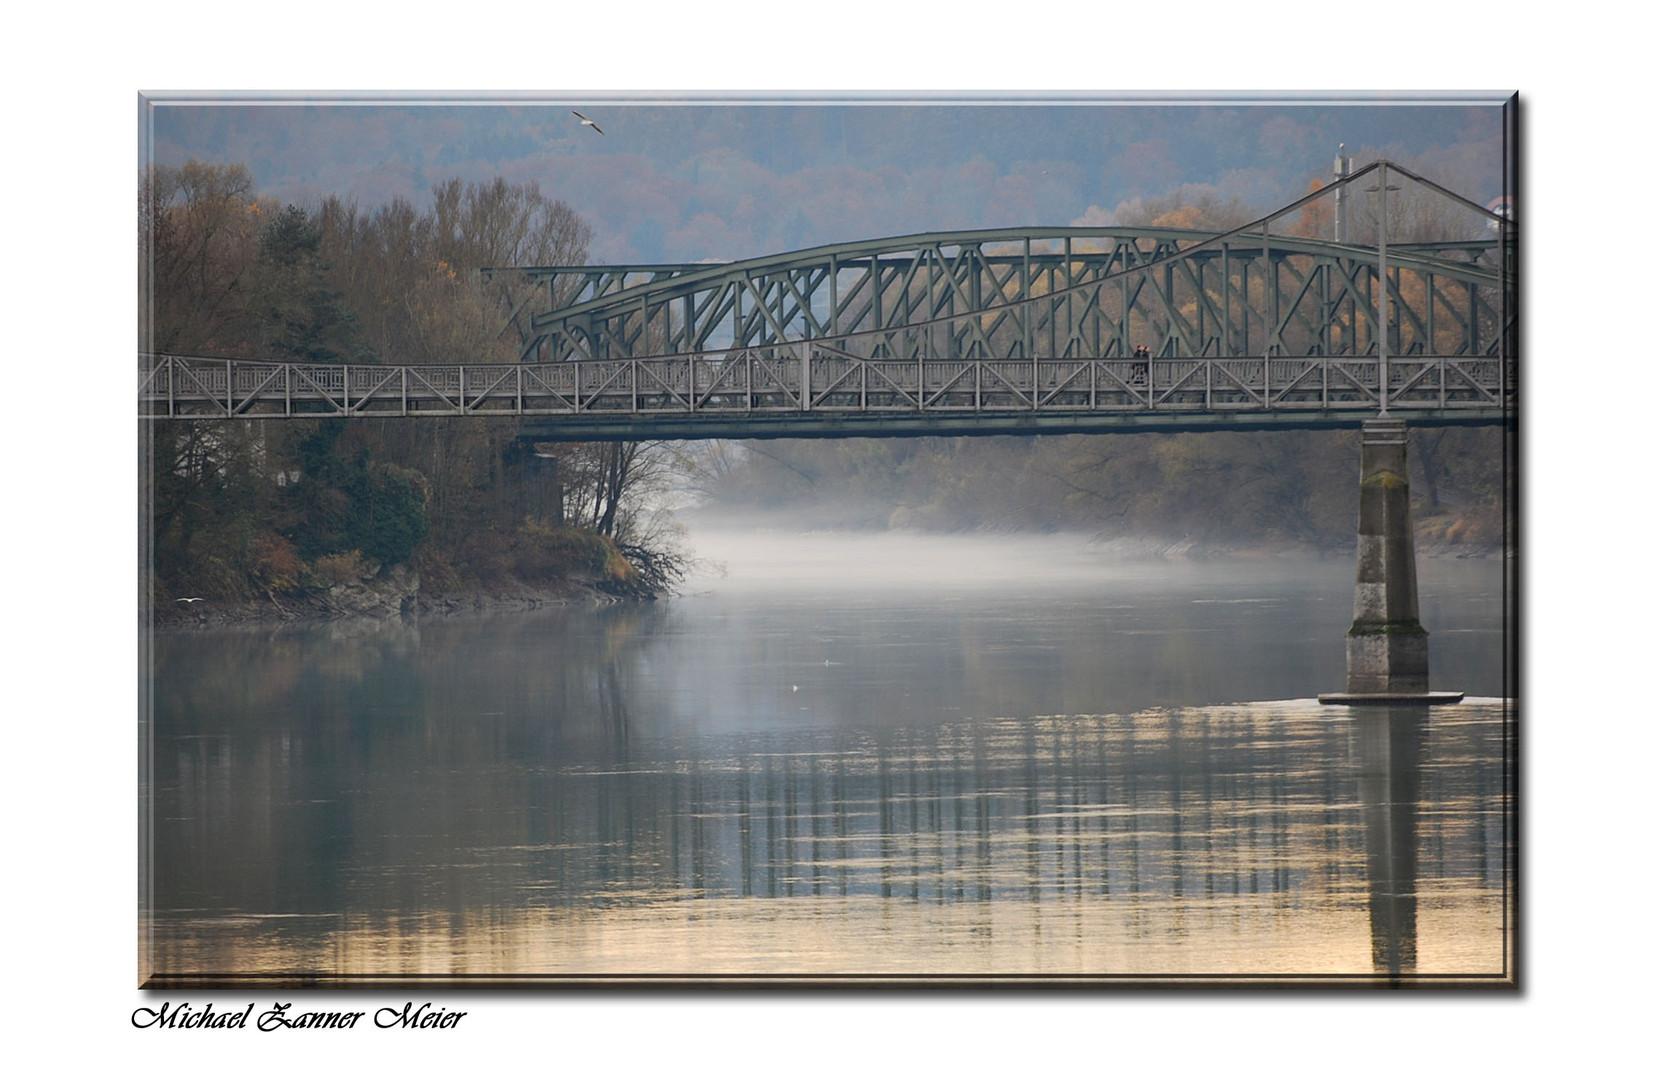 Morgen Nebel der Inn bei Passau